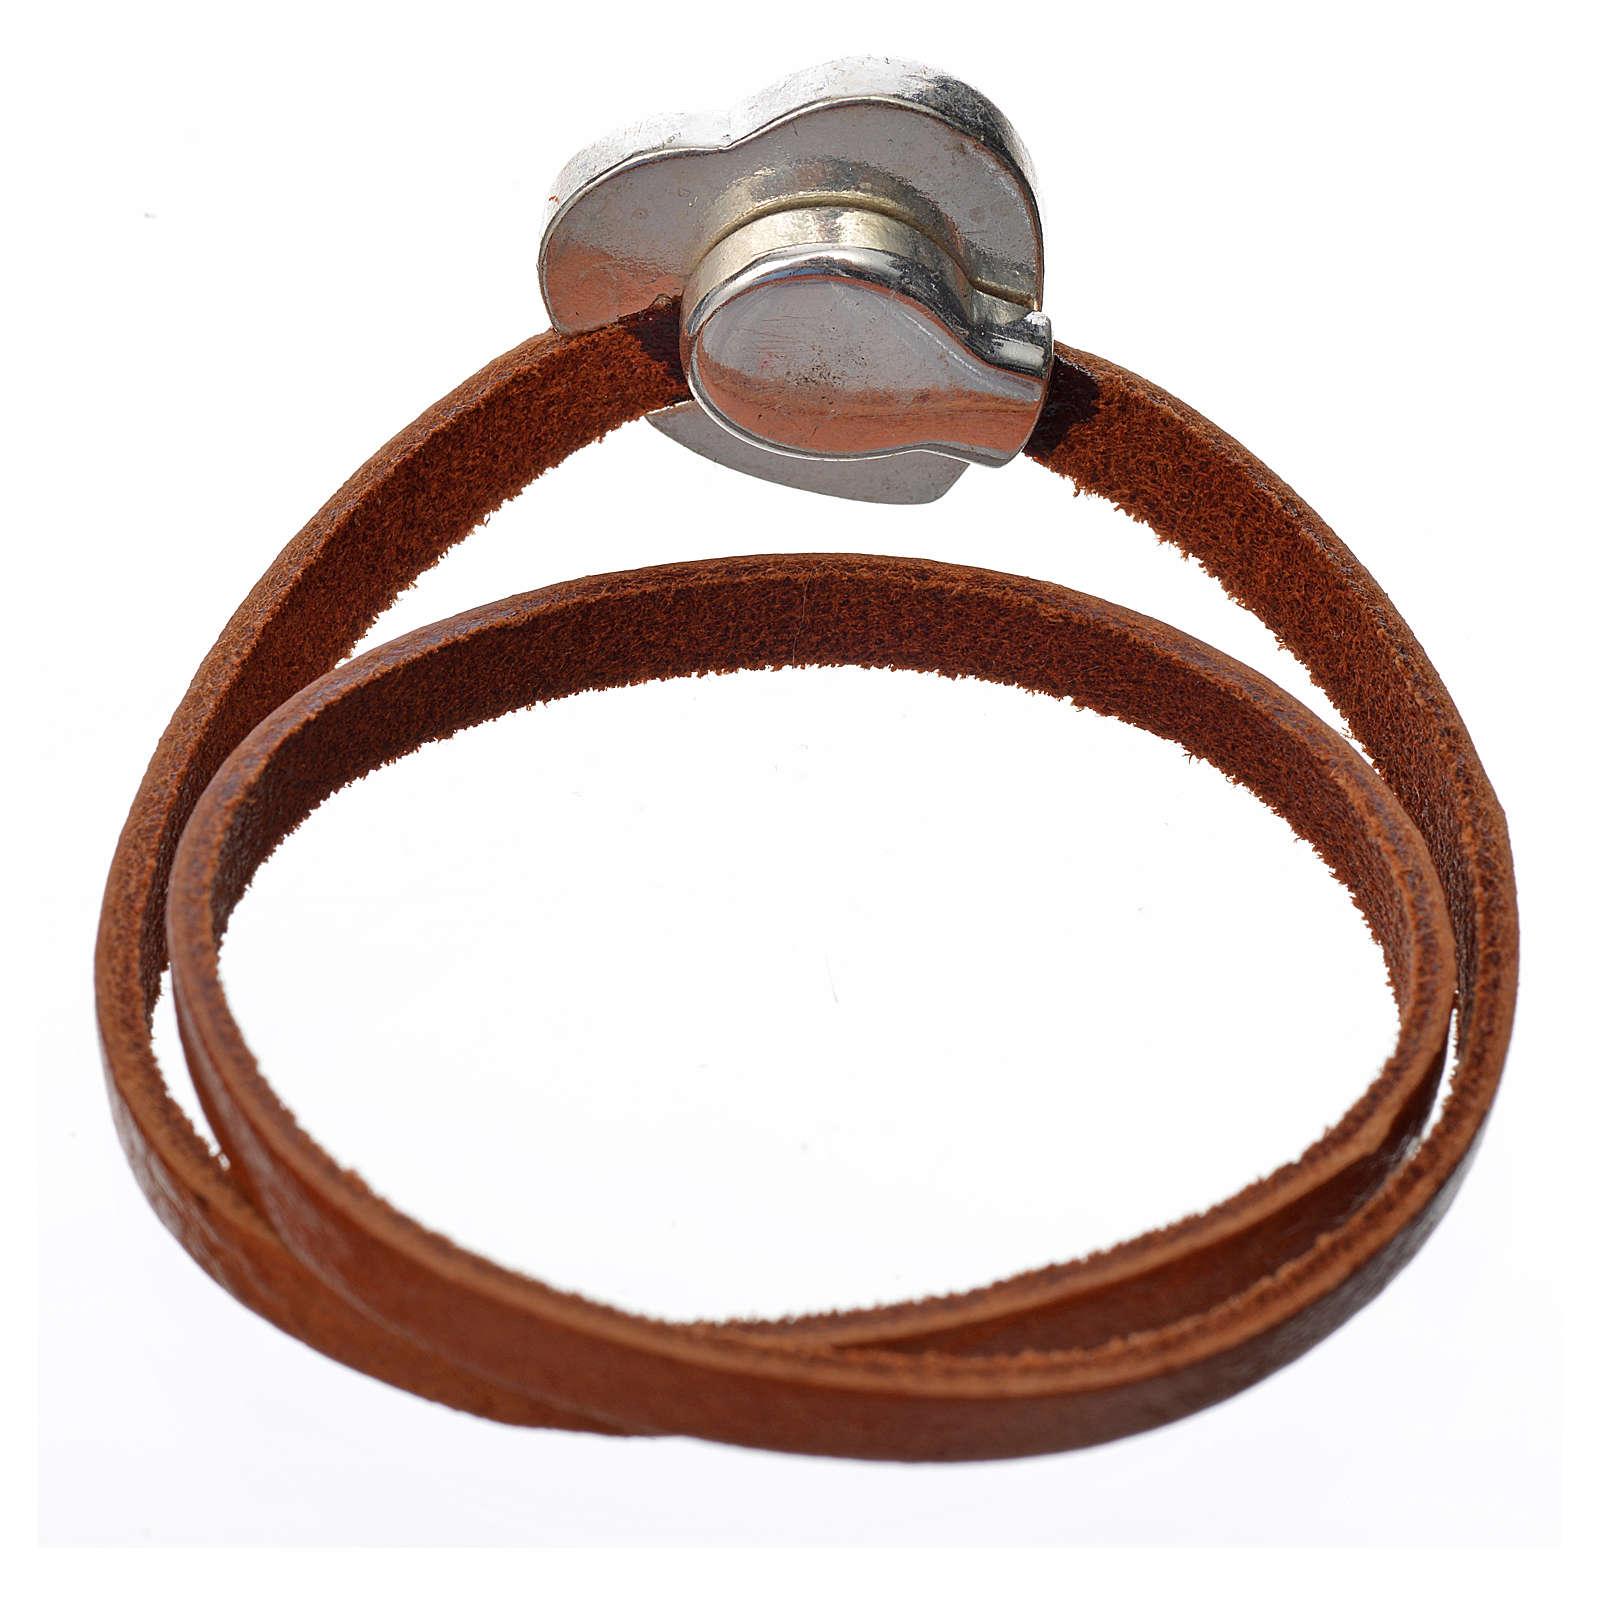 Bracelet image Vierge Marie cuir marron clair 4